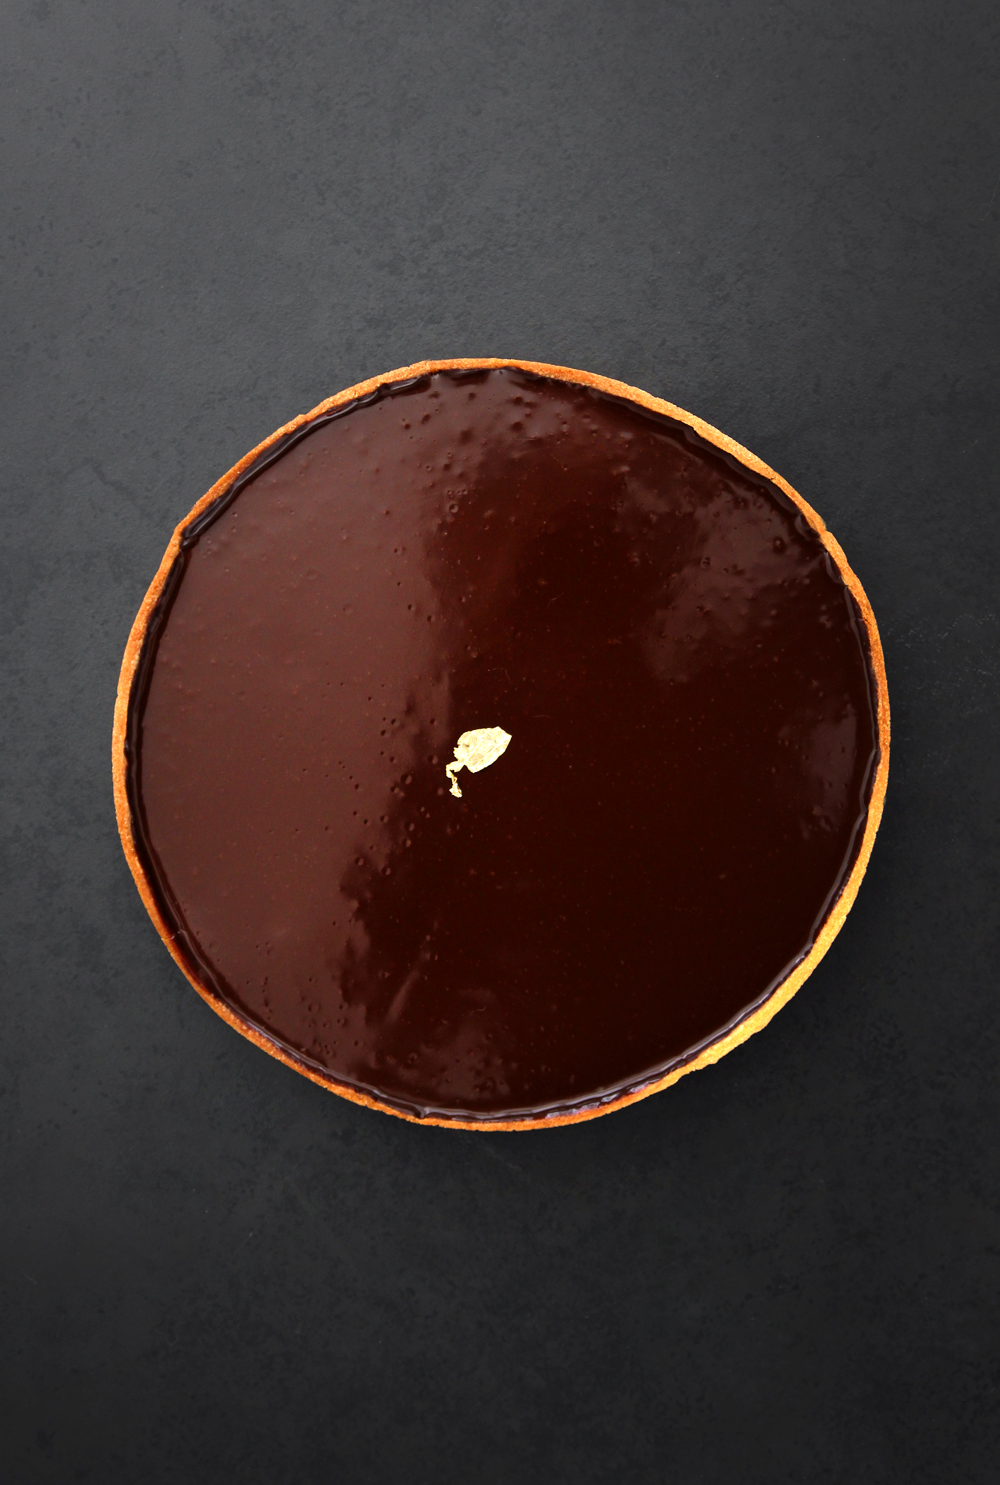 Jacques Genin Chocolate Tart